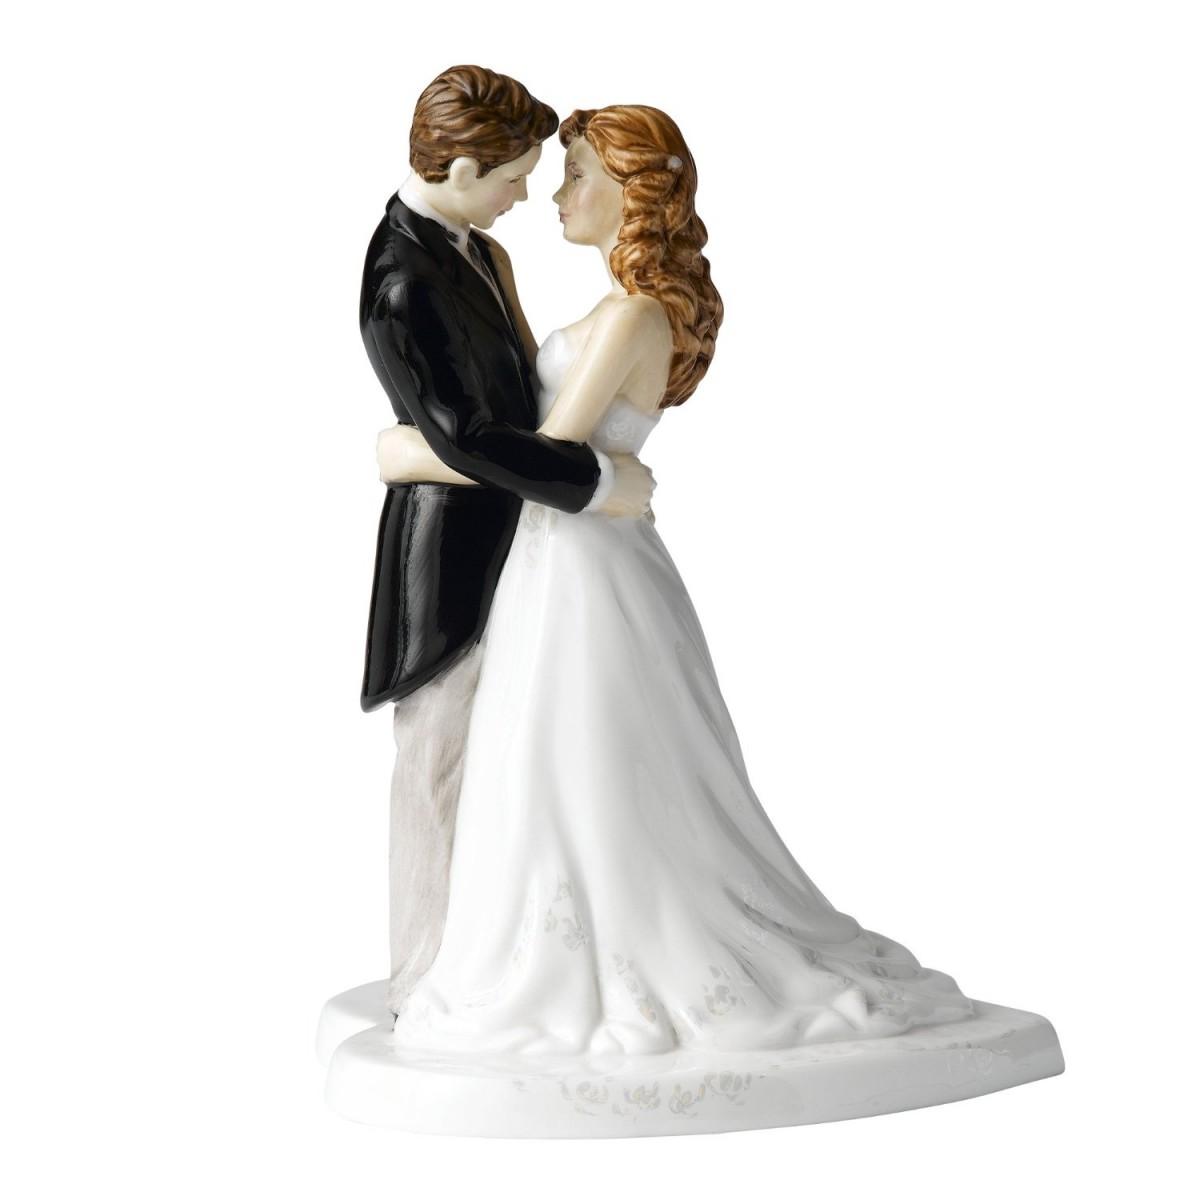 Topo para Bolo - Nosso Casamento